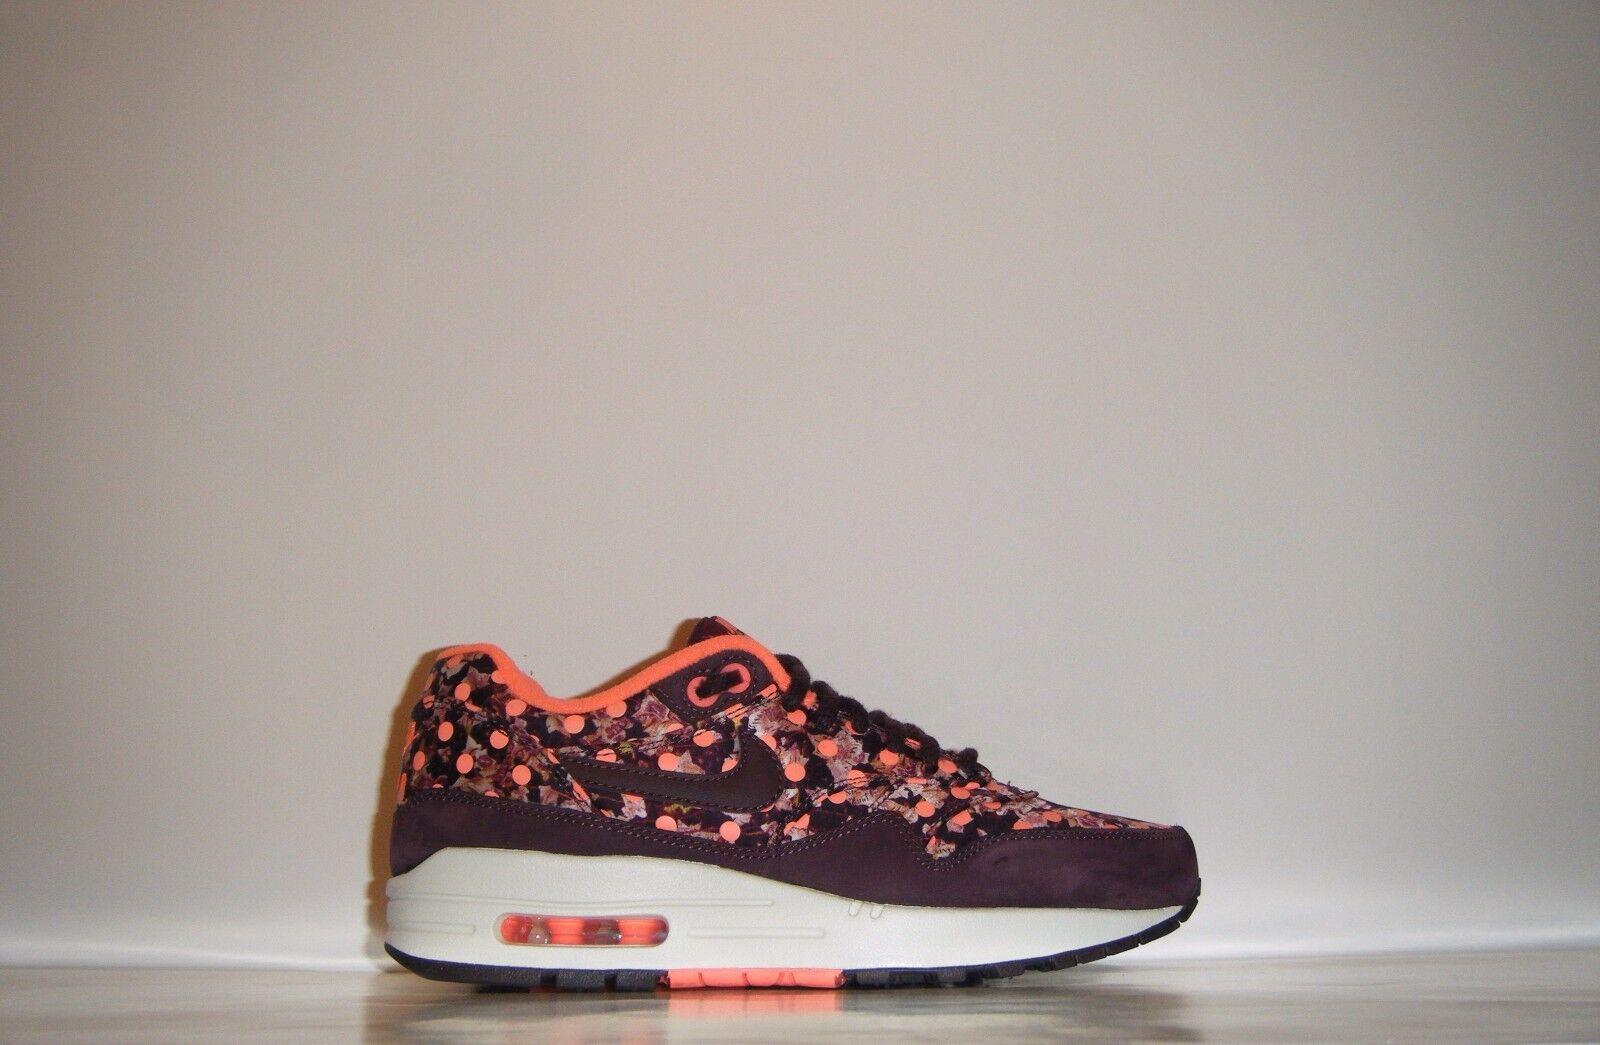 detailed look b681a 387ab ... Womens 2014 Nike Air Max 1 LIB LIB LIB Premium Liberty Of London QS Sz  5.5